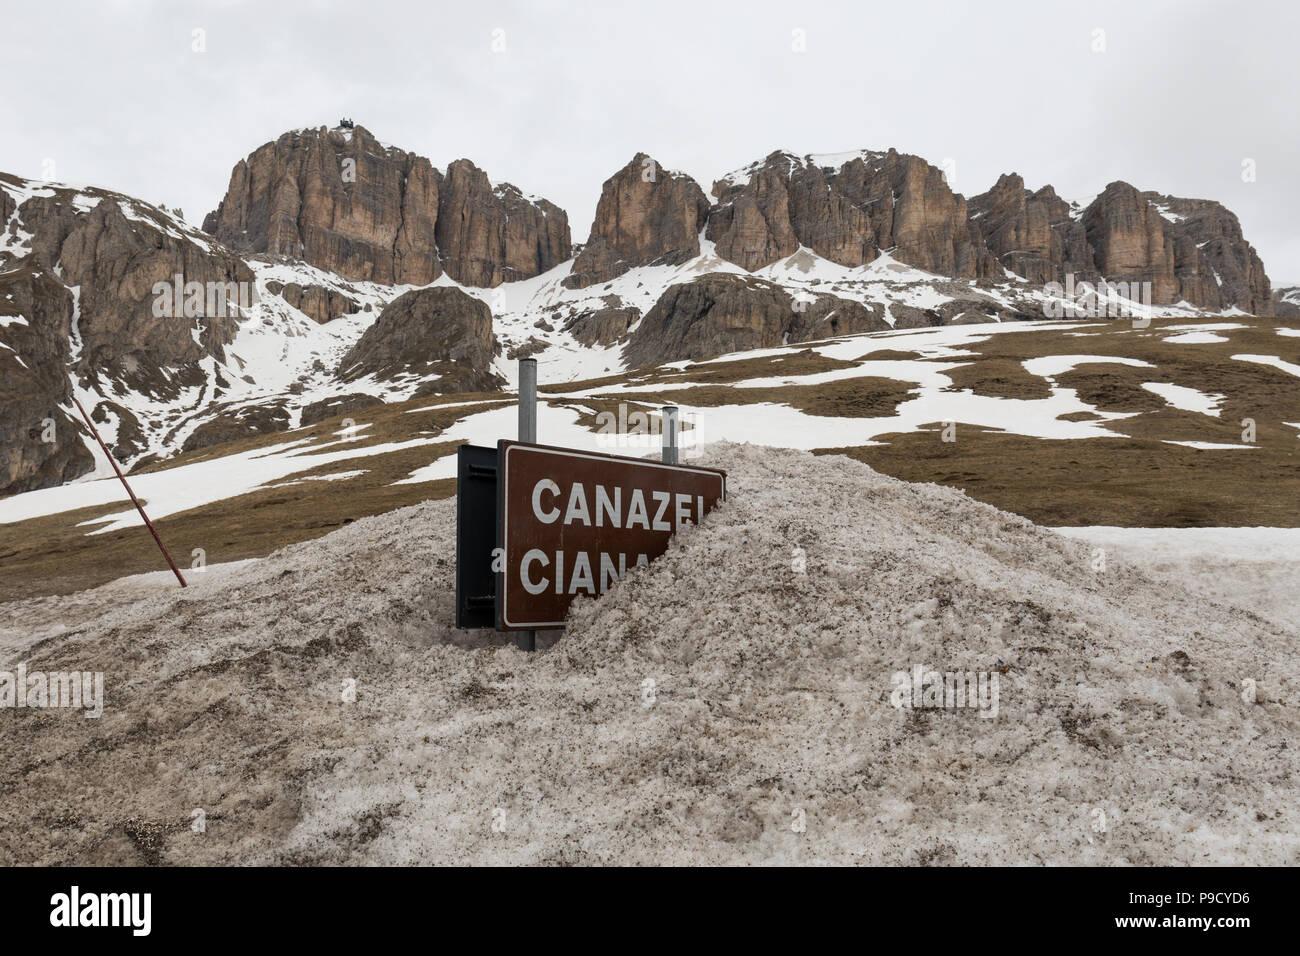 Canazei (Cianacei in Ladino language) road sign covered in snow at Passo Pordoi (Pordoi Pass), Dolomites, Italy - Stock Image